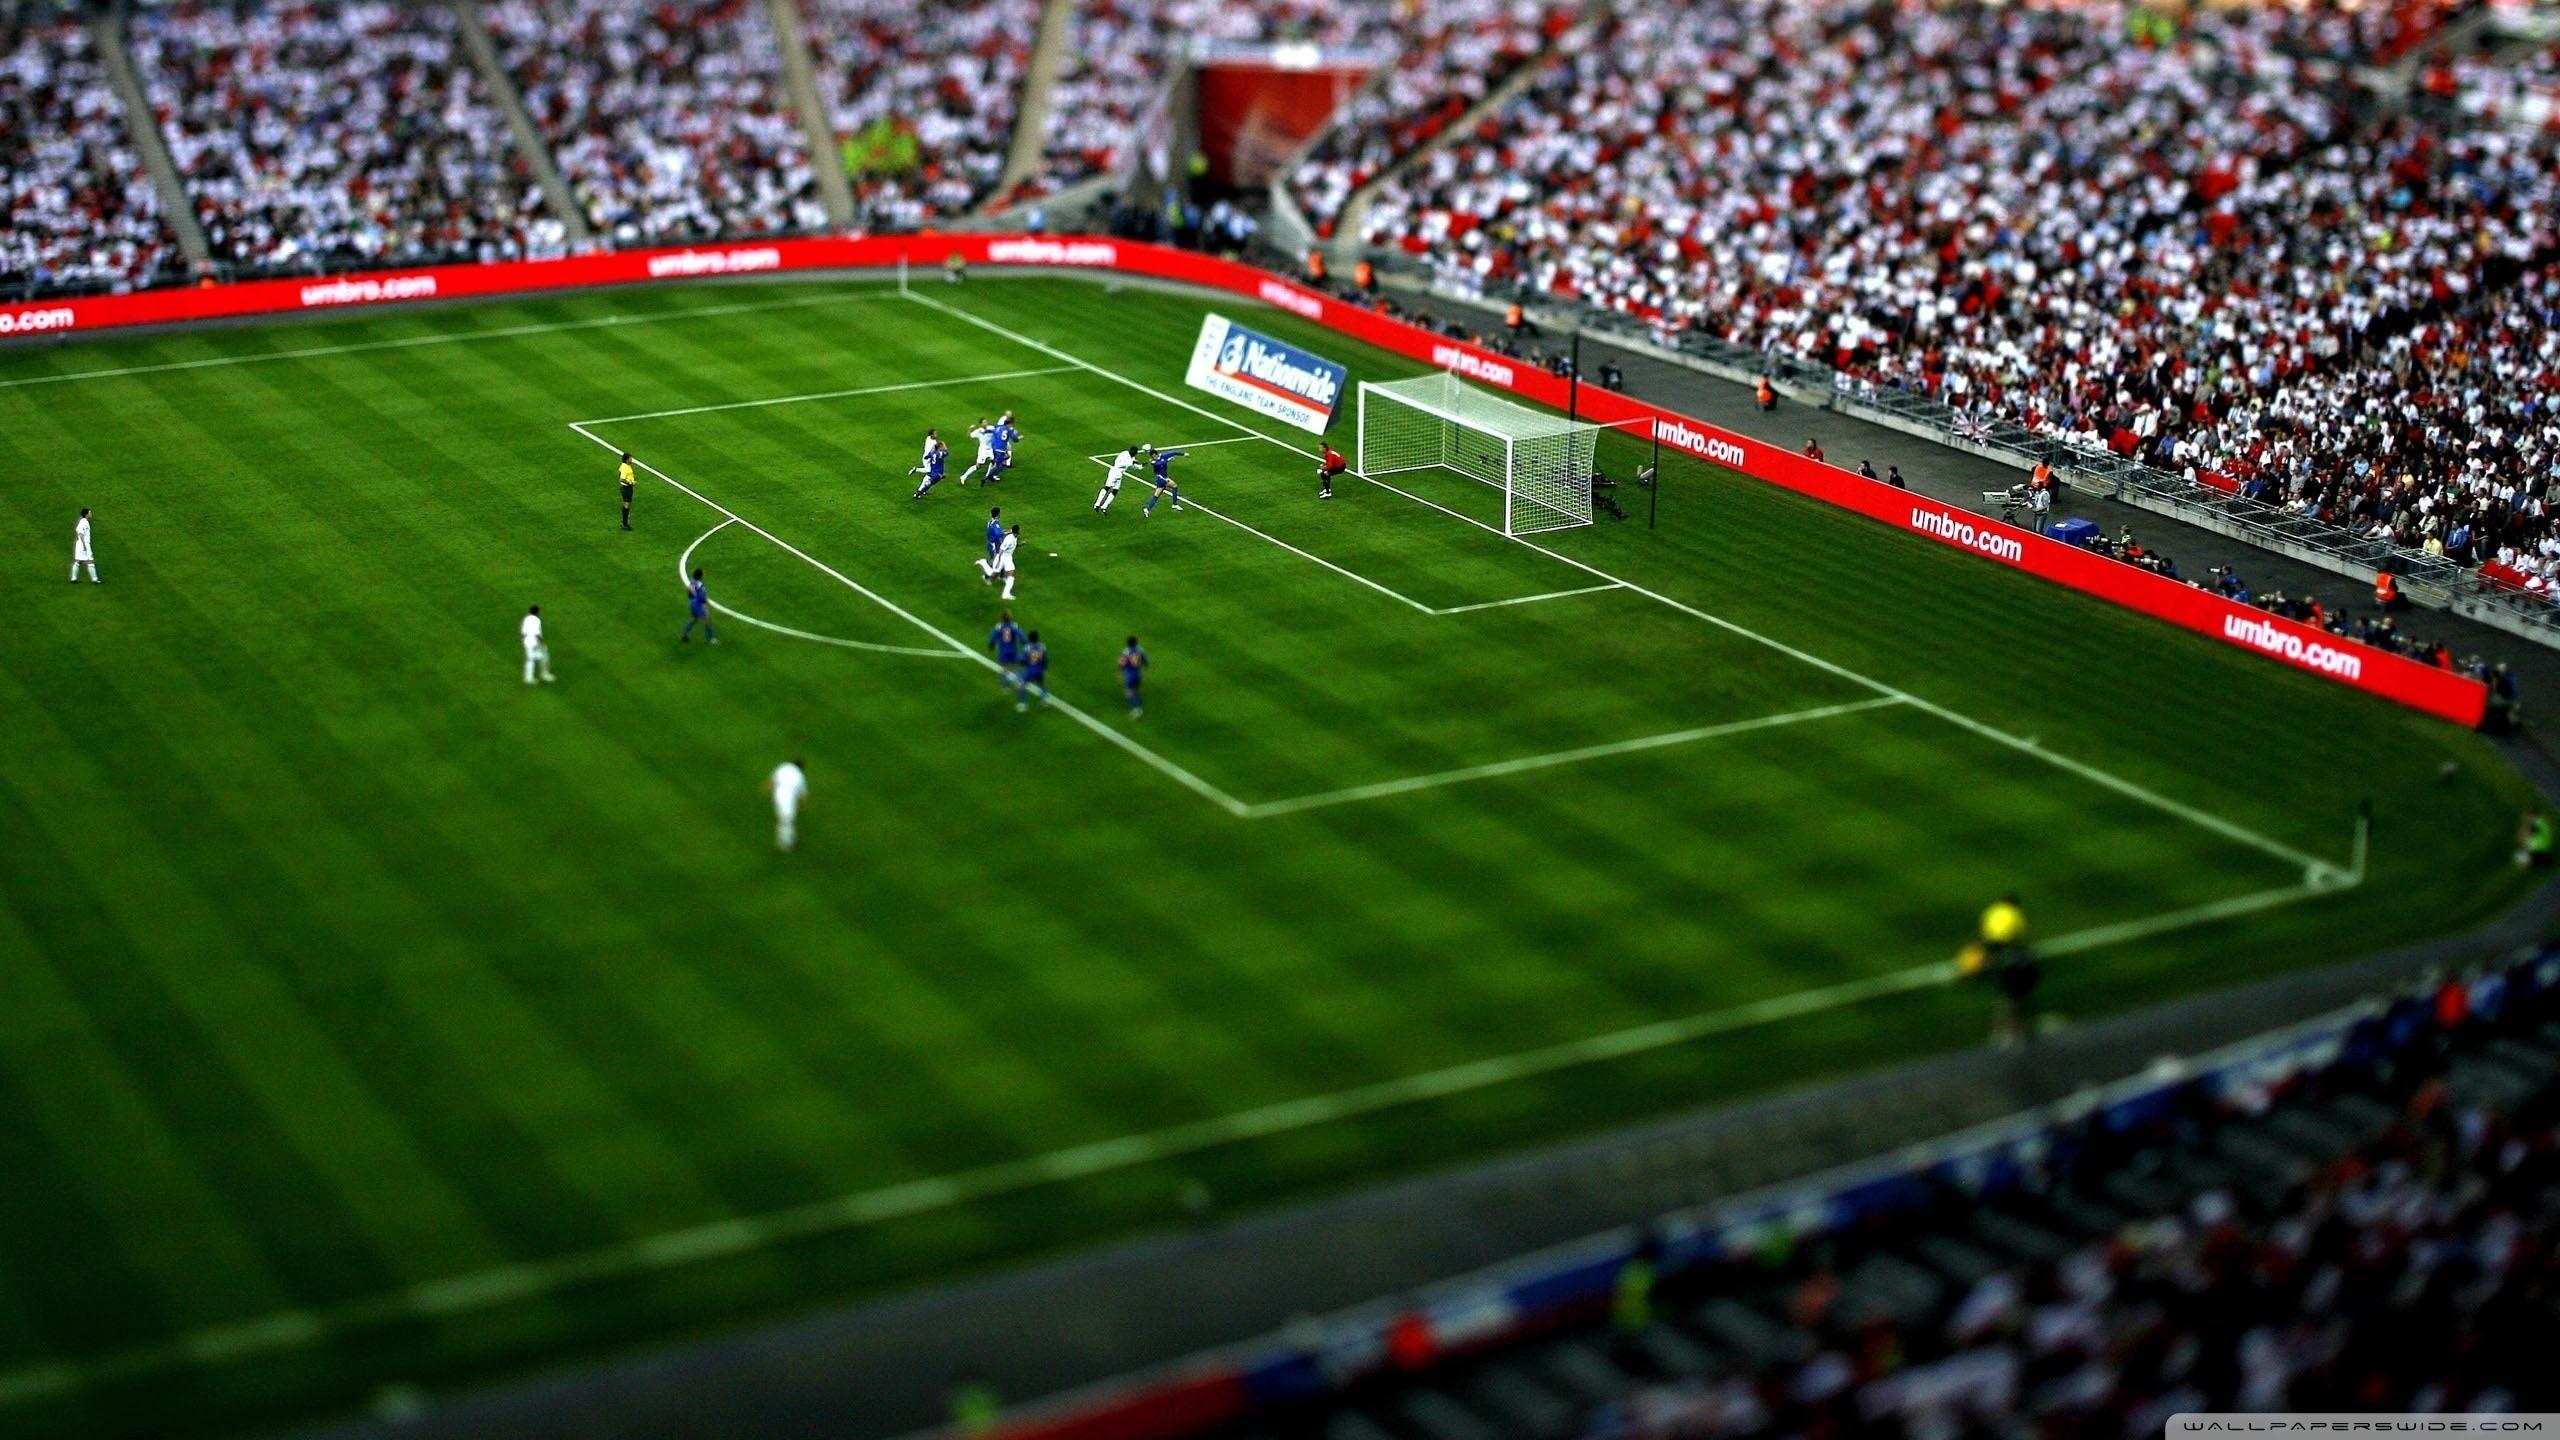 Free Football Wallpapers: Ji Sung Park Soccer Player From Asia | Download  Wallpaper | Pinterest | Wallpaper free download, Hd wallpaper and Wallpaper